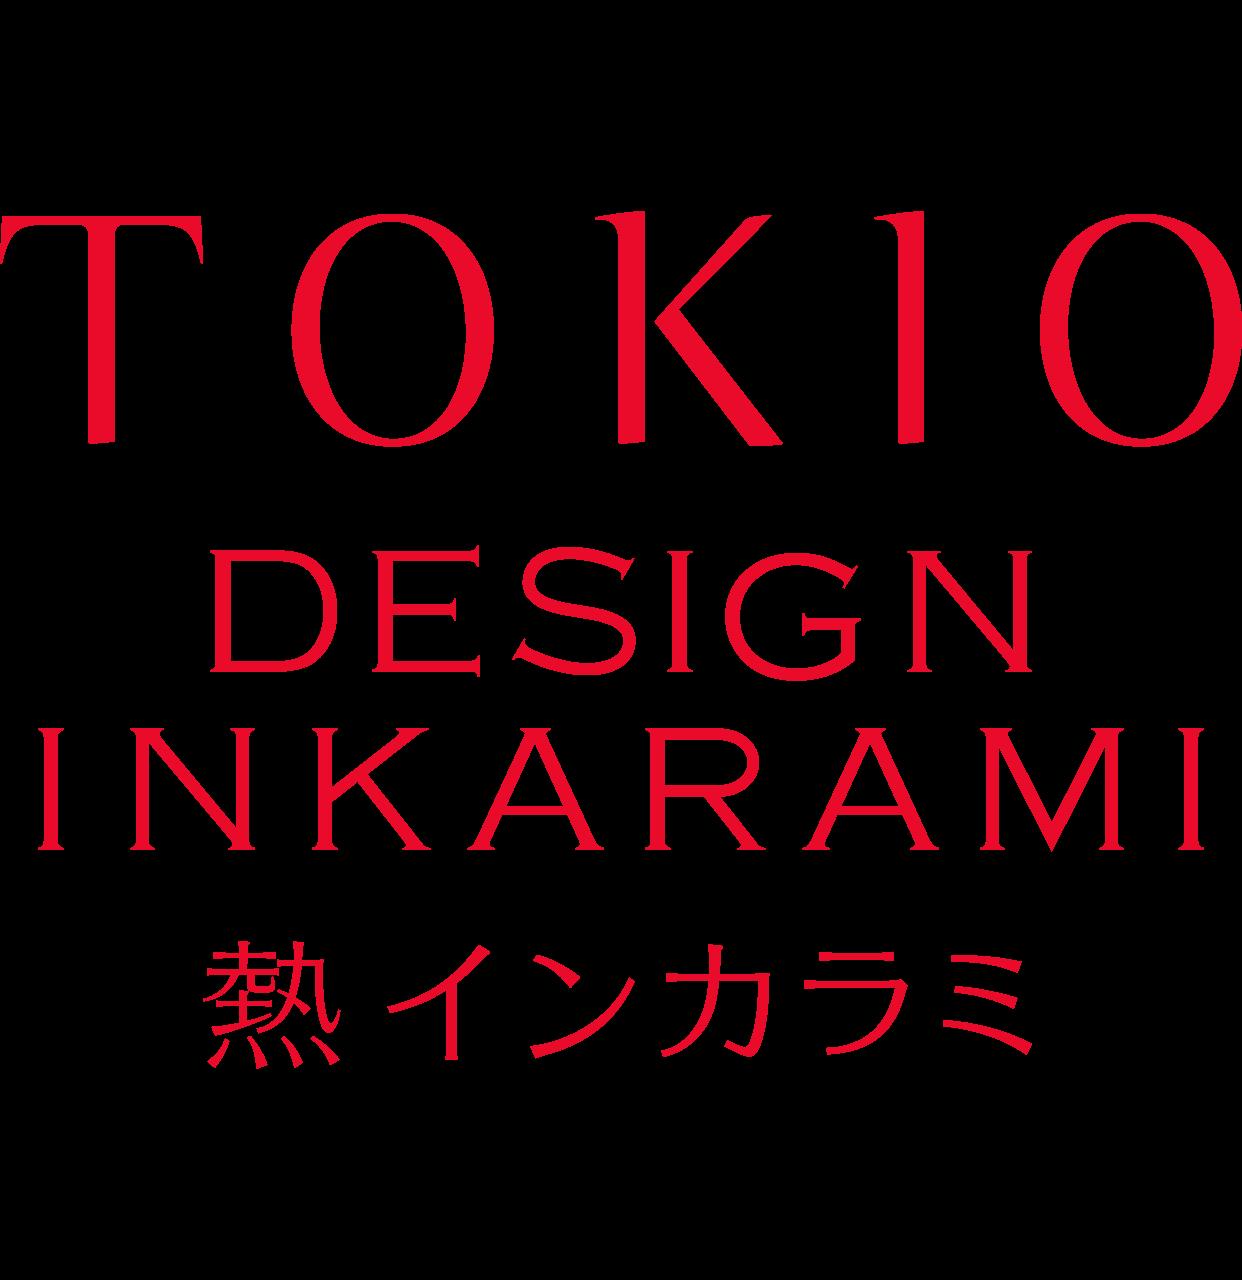 TOKIO DESIGN INKARAMI